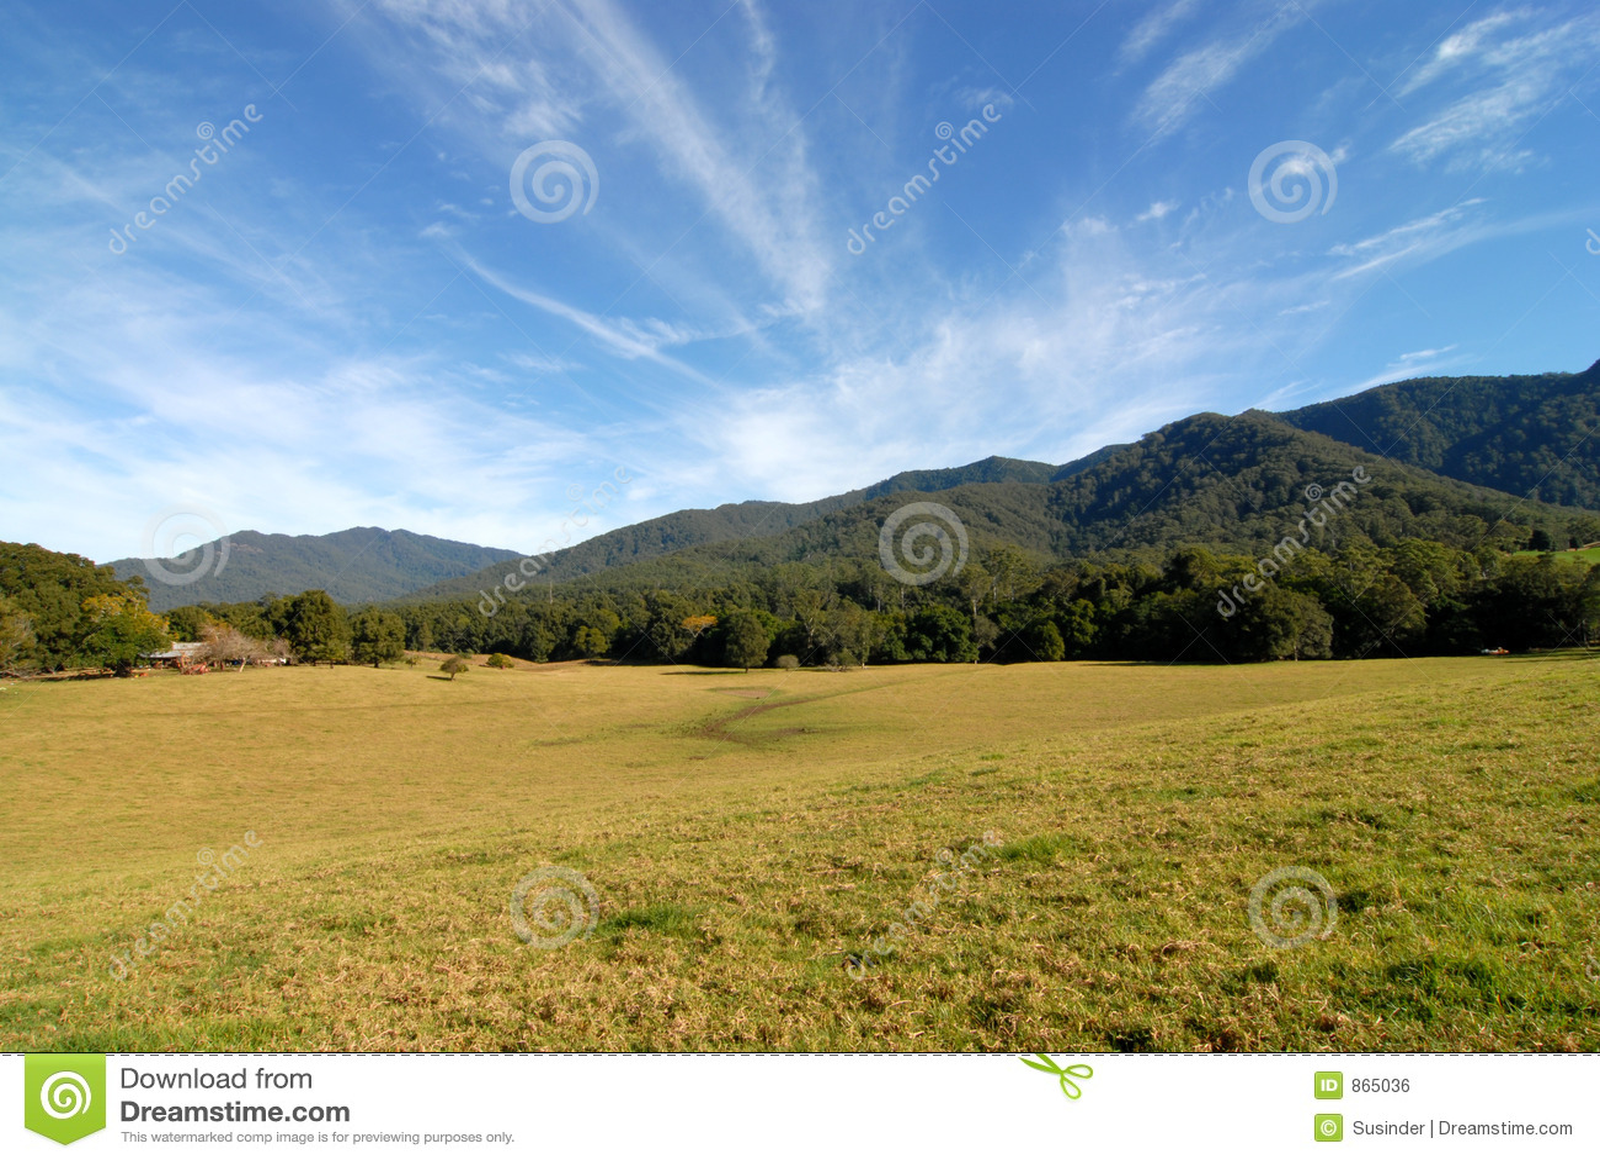 Fam βουνά κάτω από την κοιλάδα